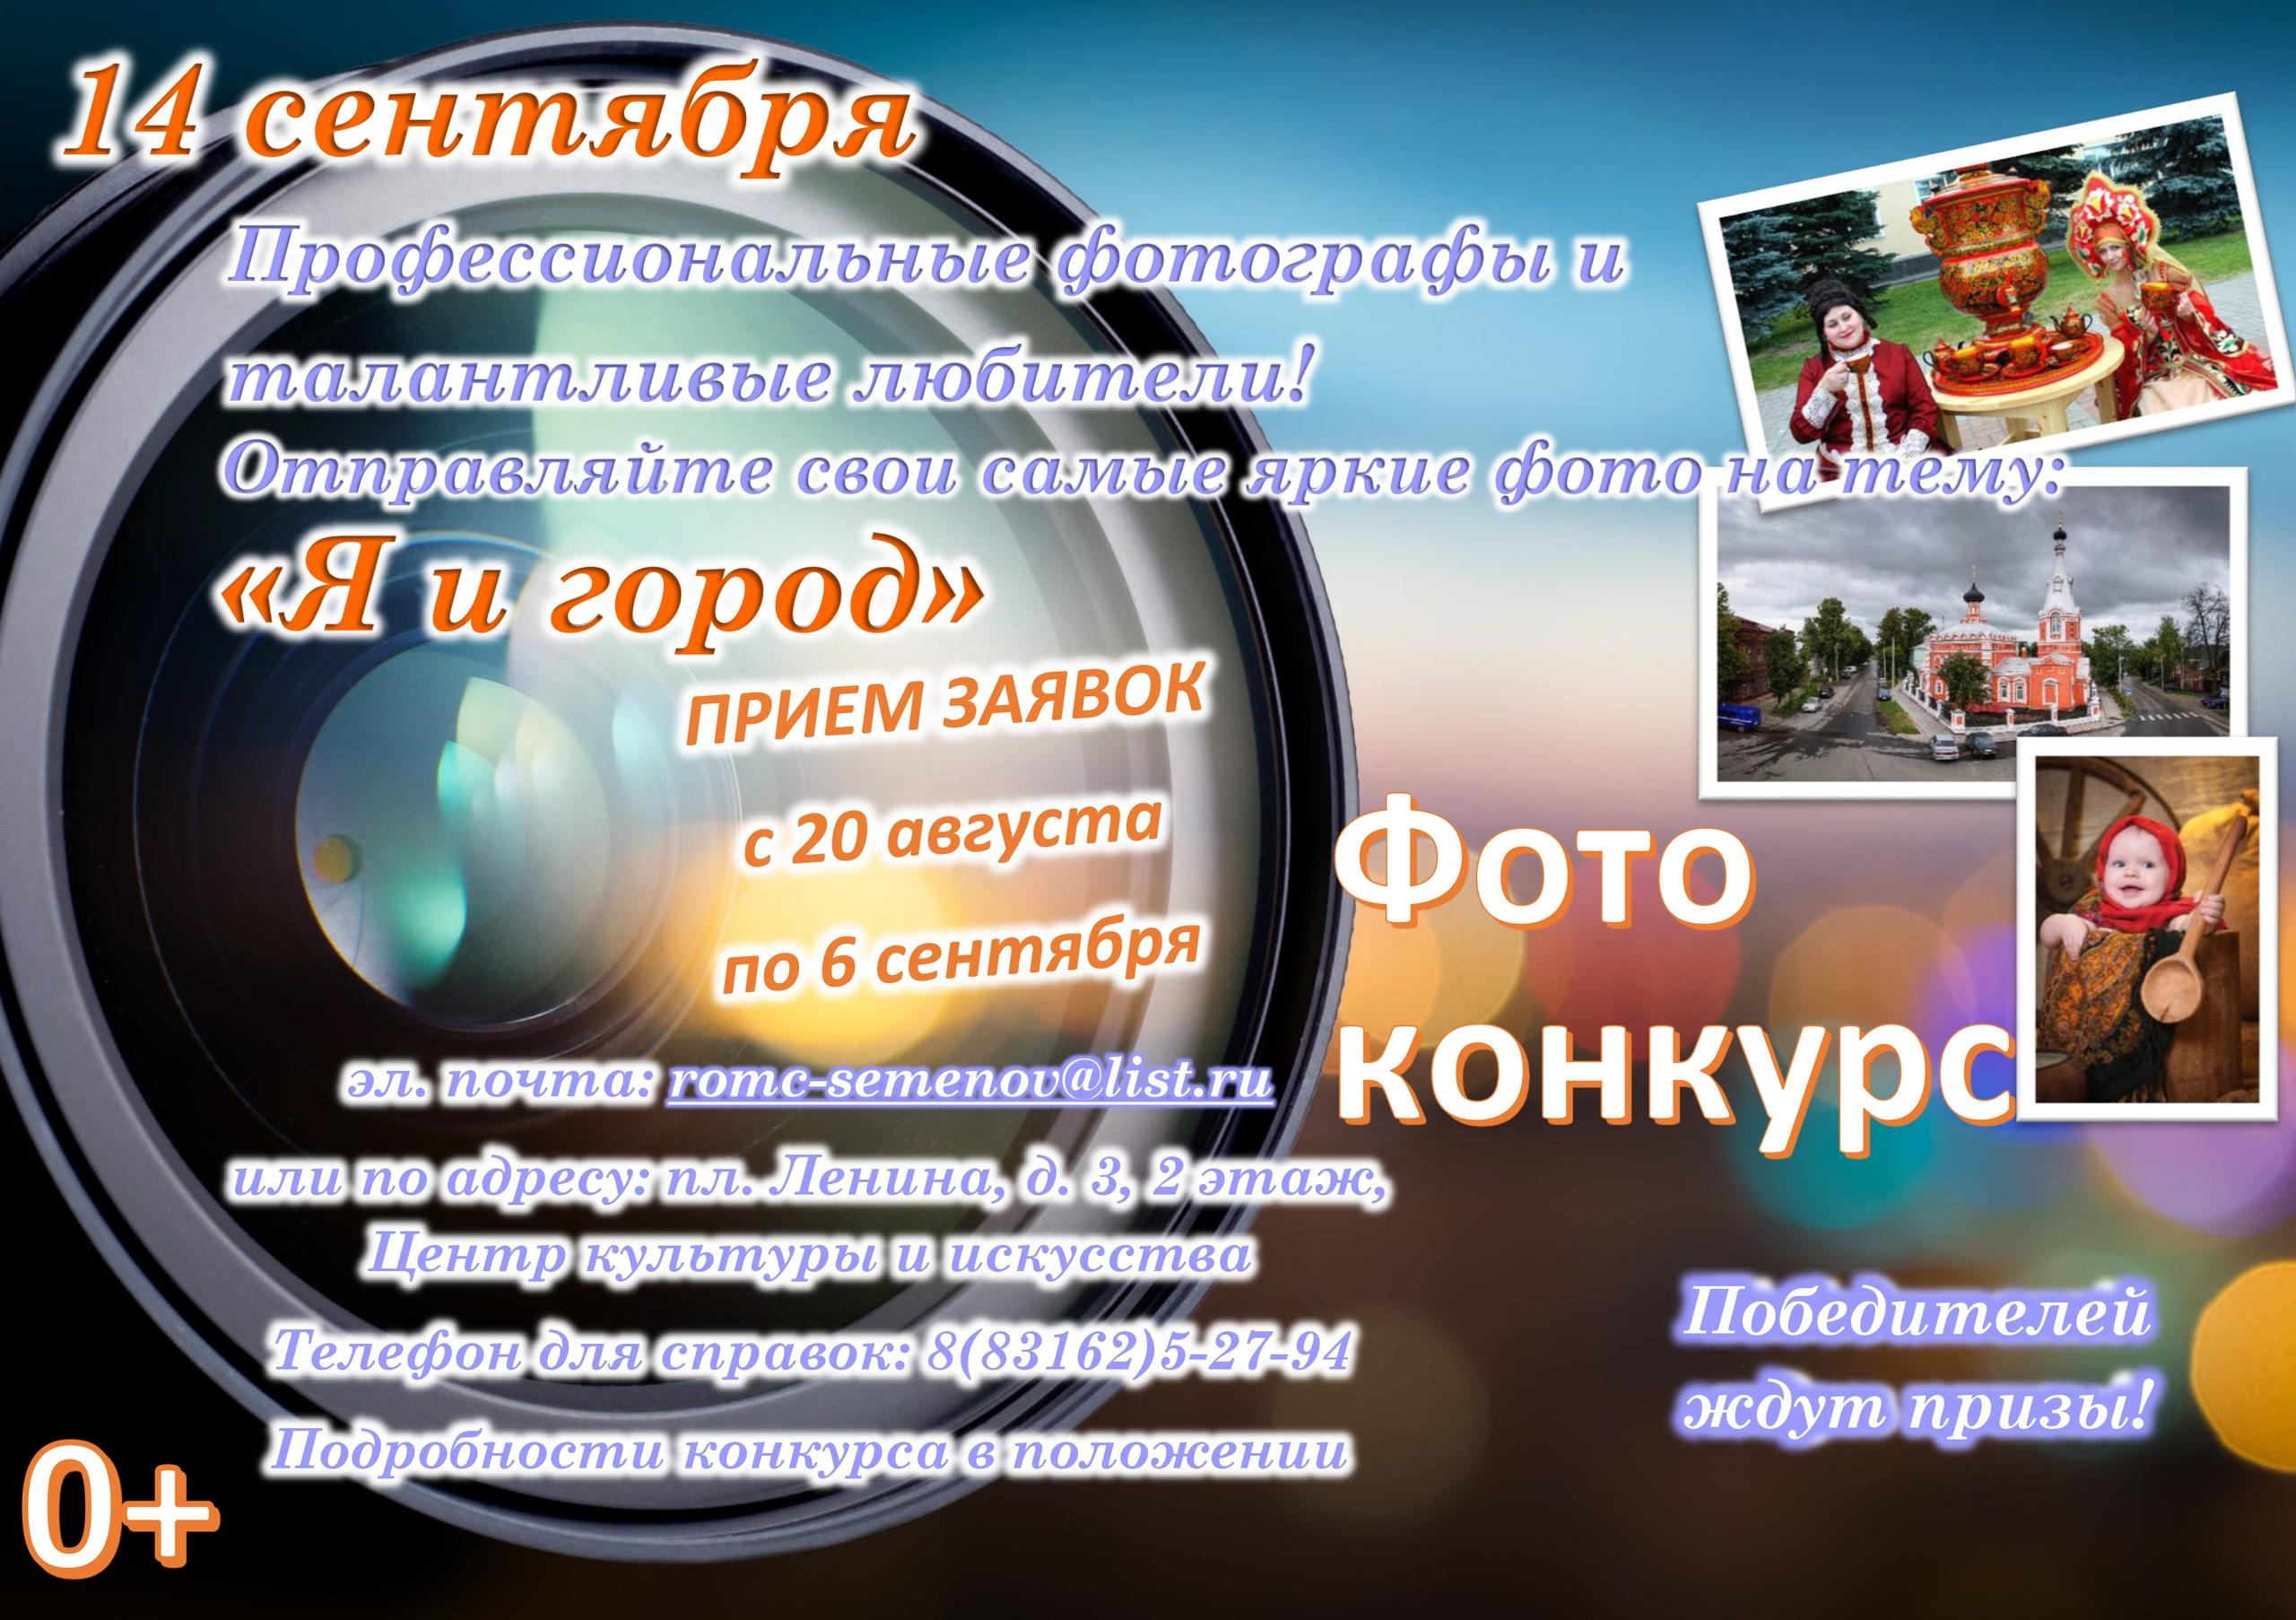 https://sun9-28.userapi.com/c850132/v850132609/1bed5c/Bmy6KPNYiQs.jpg